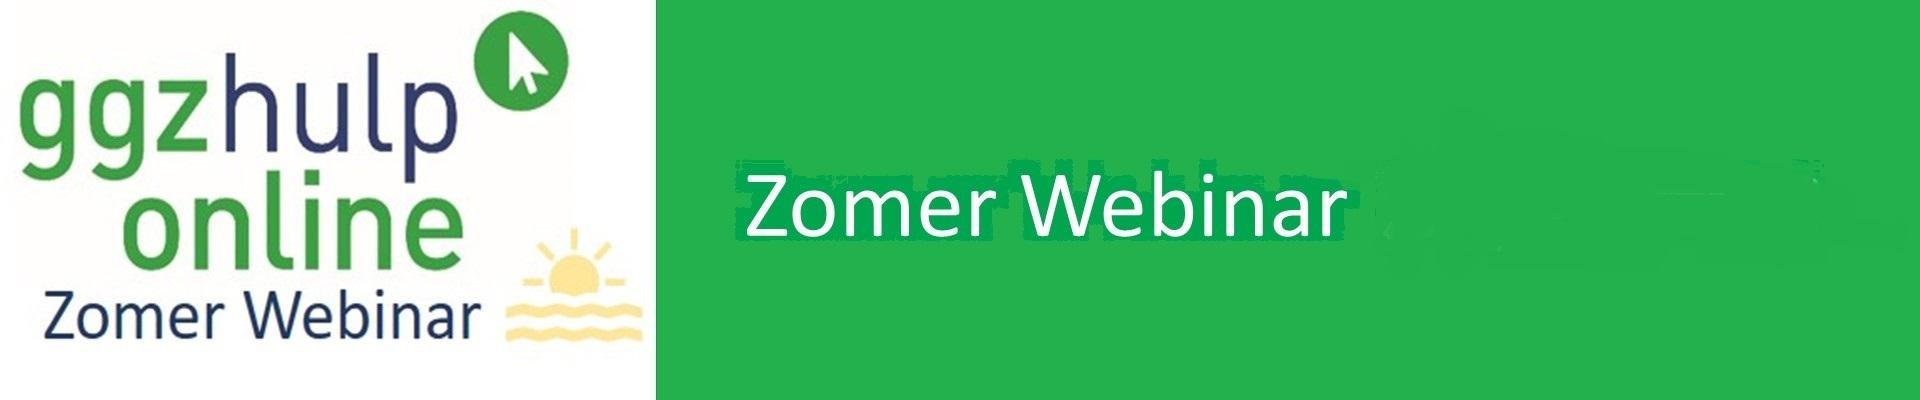 13-10-2020 Zomerwebinar ggzhulponline